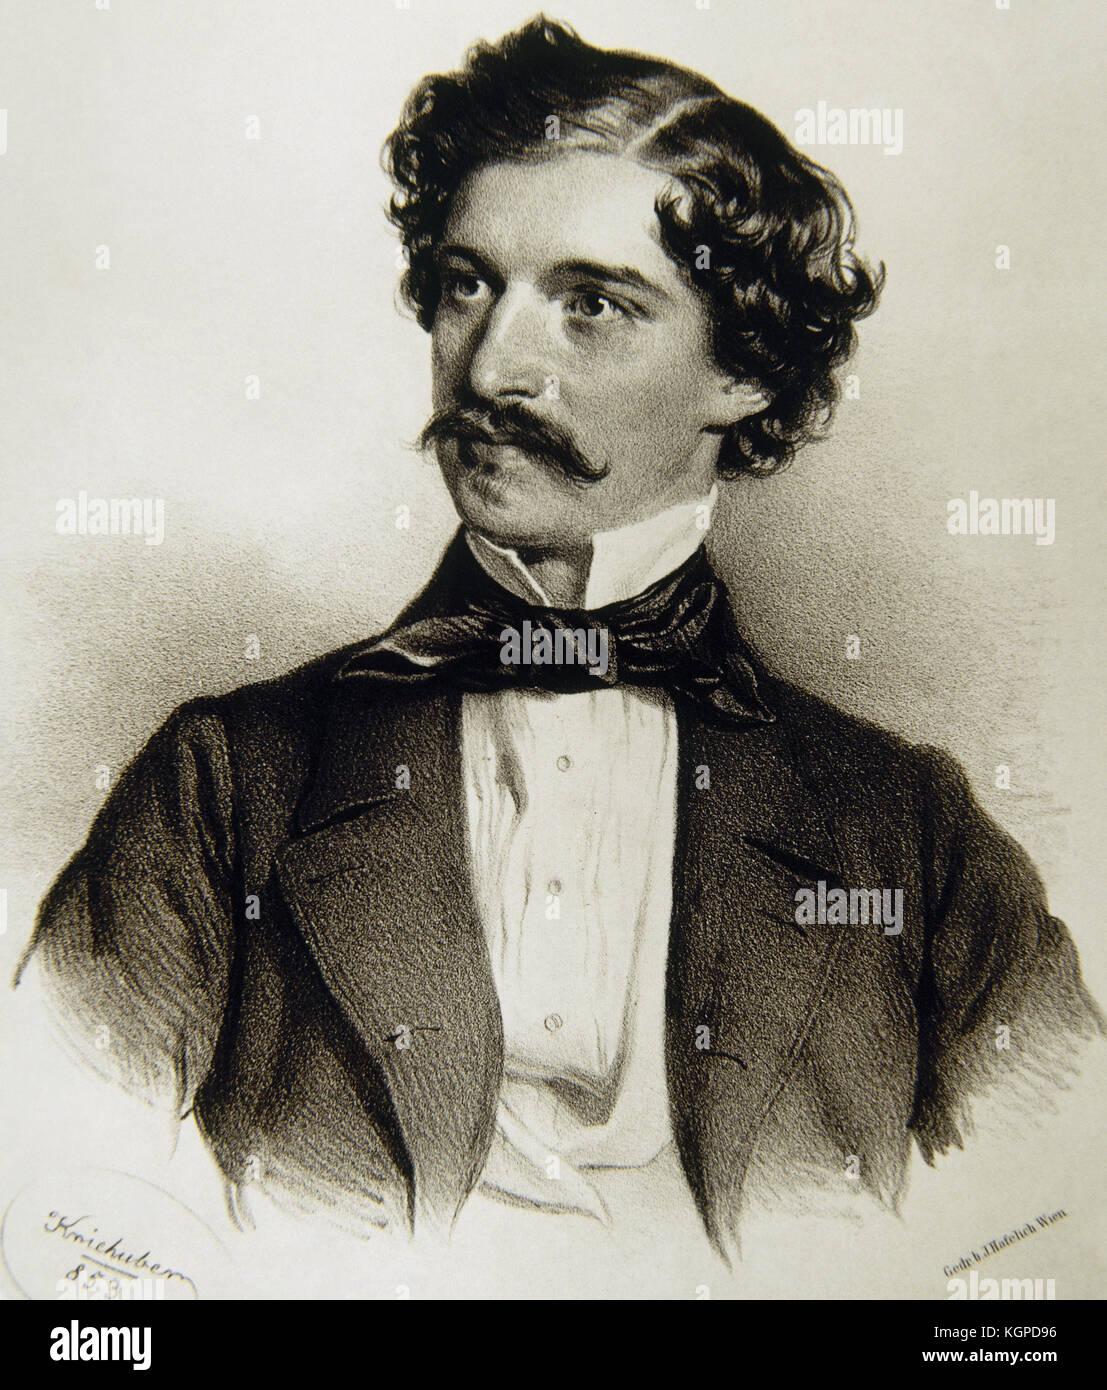 Johann Strauss II (1825-1899). Austrian composer of light music. Portrait. Engraving by Joseph Kriehuber (1800-1876), Stock Photo